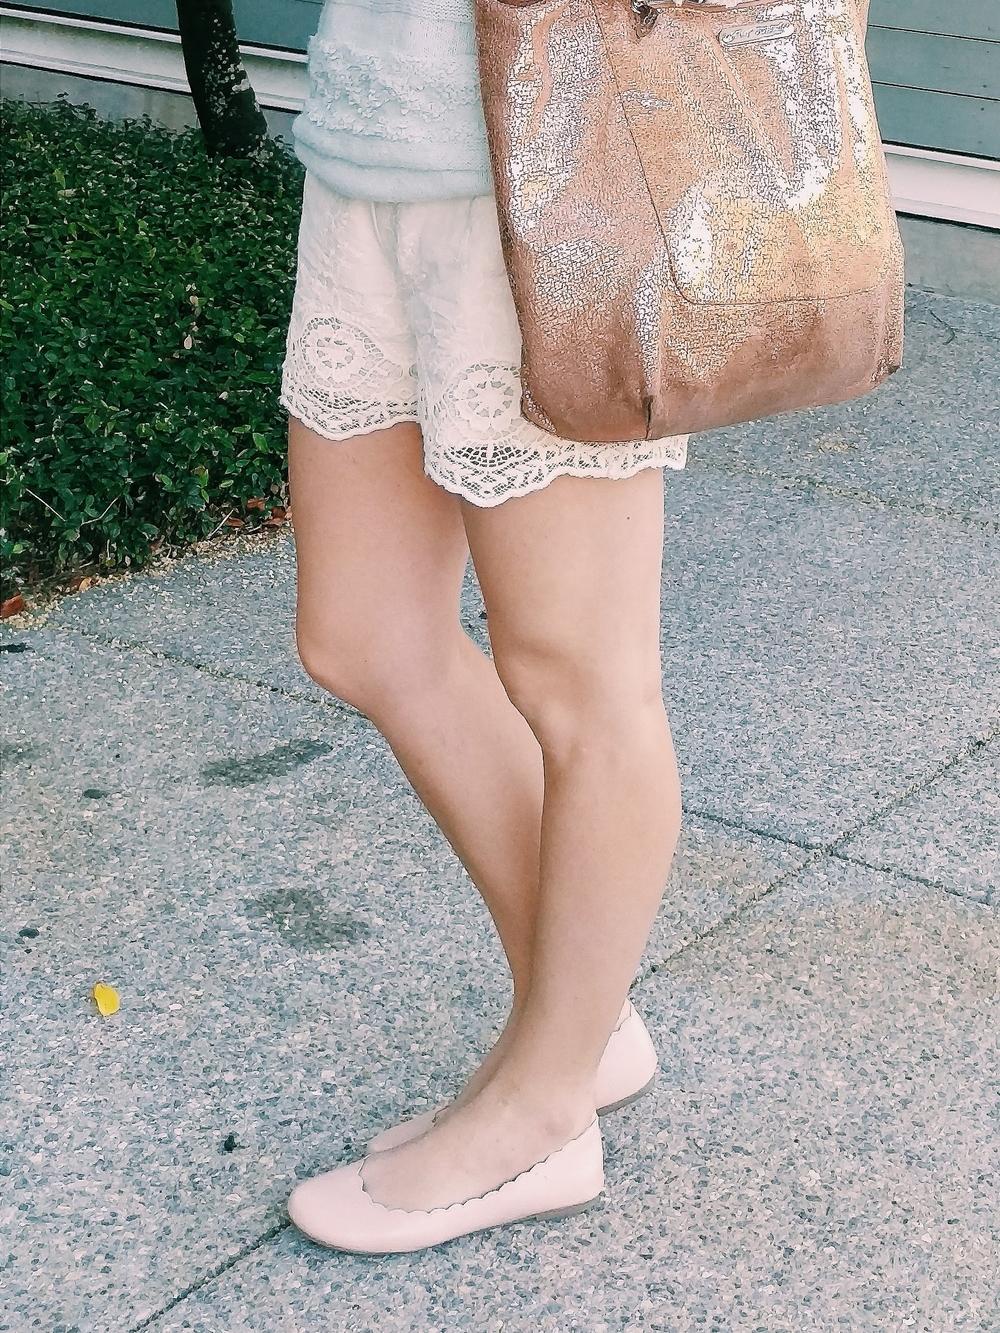 Sunday Sweater and Shorts - Three Heel Clicks 2.jpg